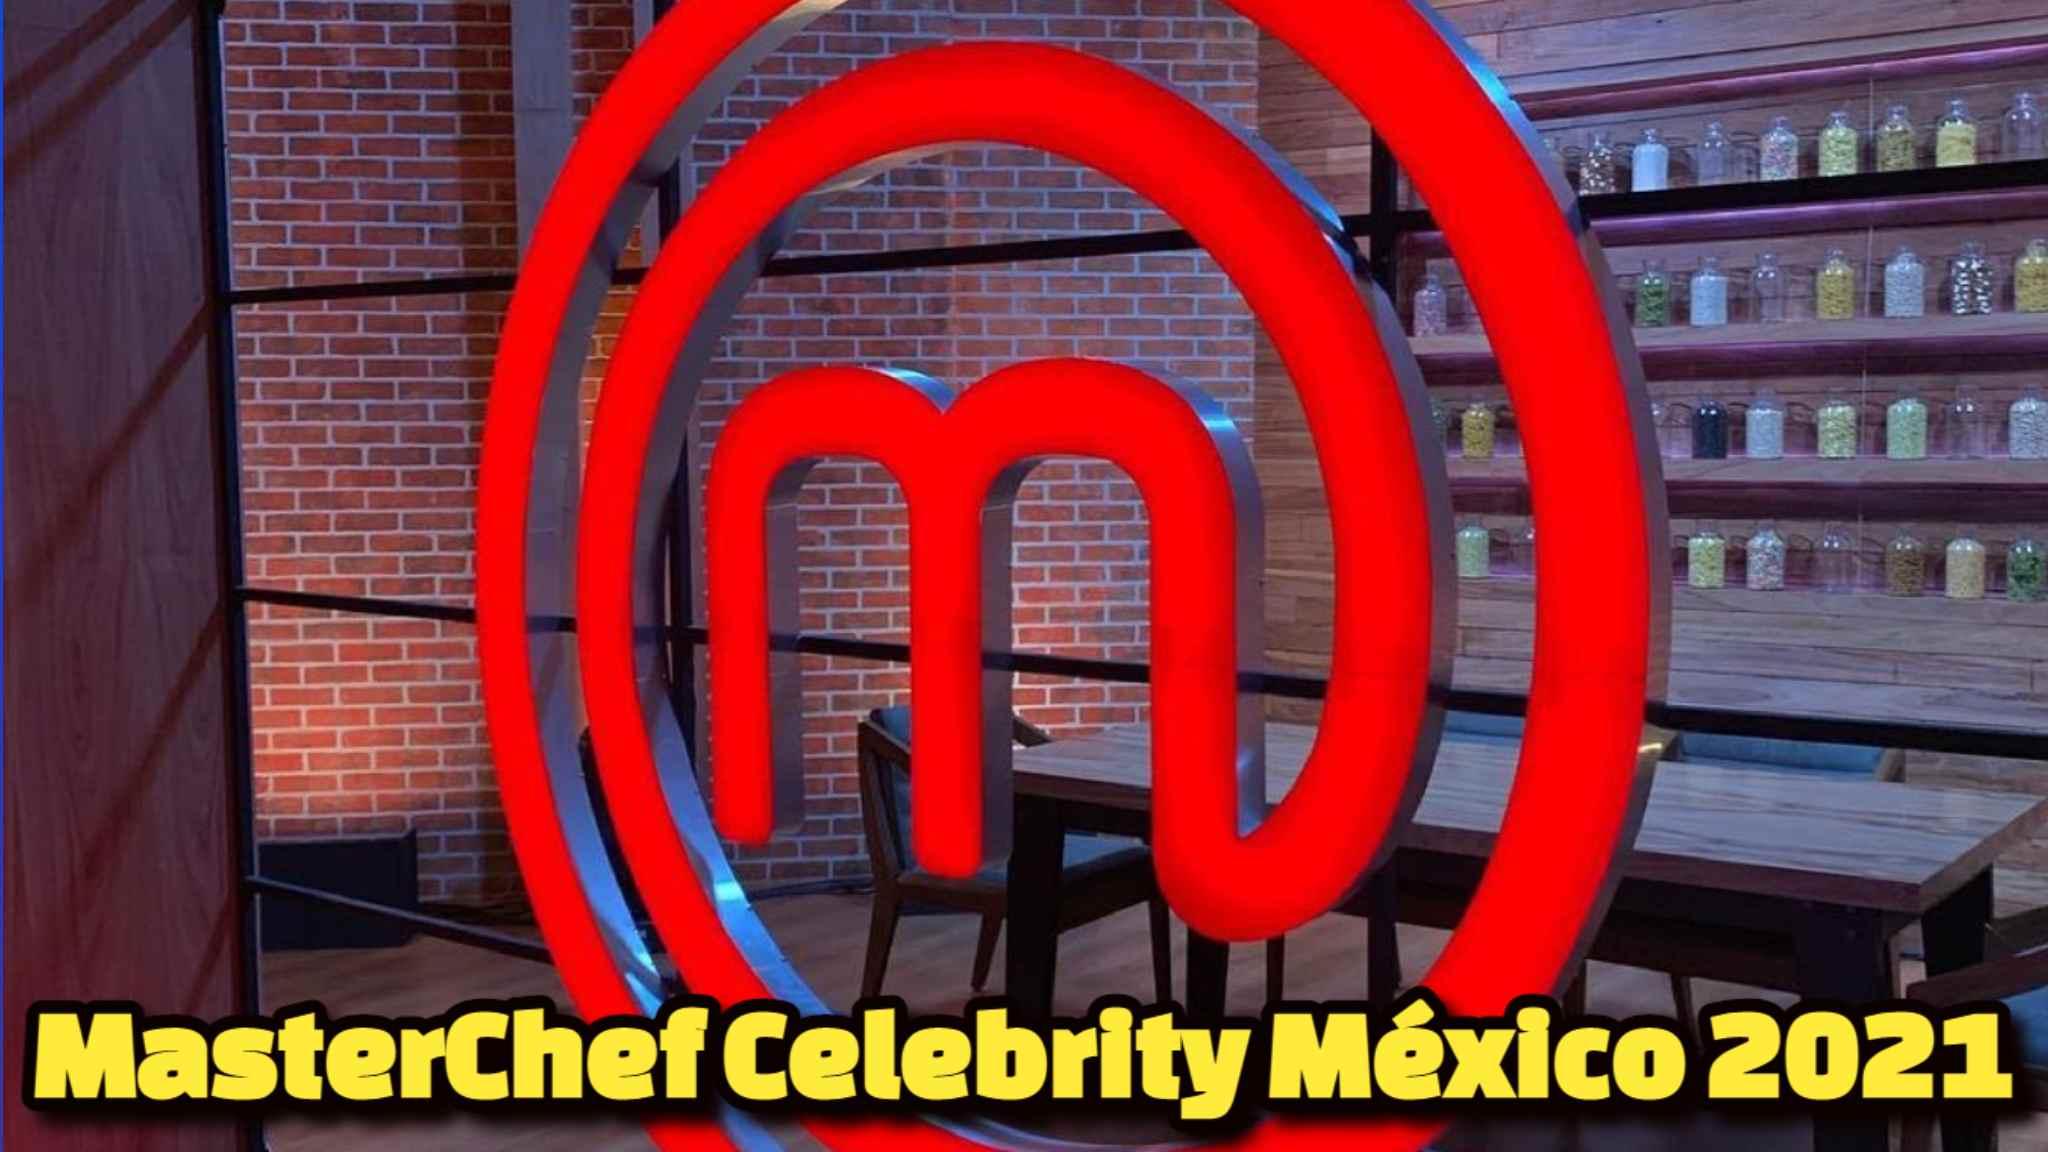 MasterChef Celebrity México 2021